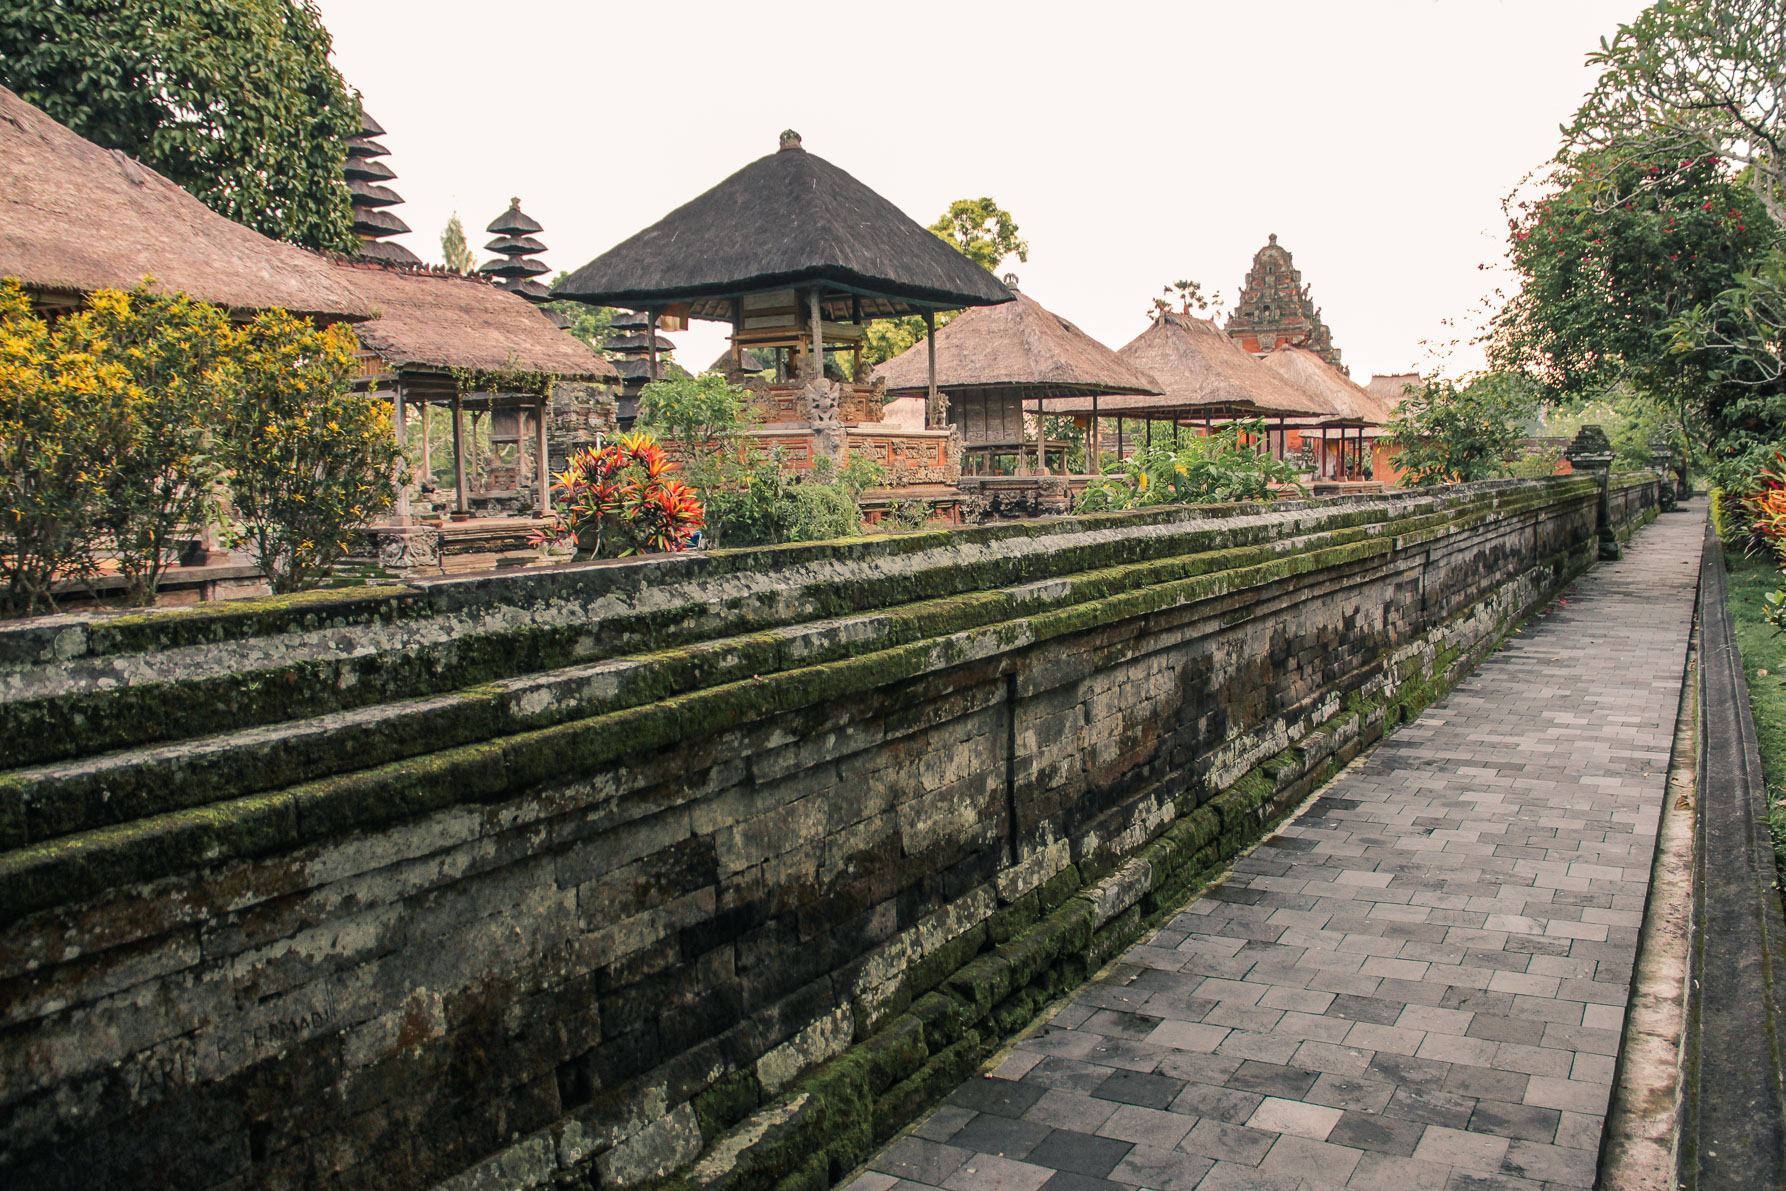 Trotoir autour du temple de Taman Ayun